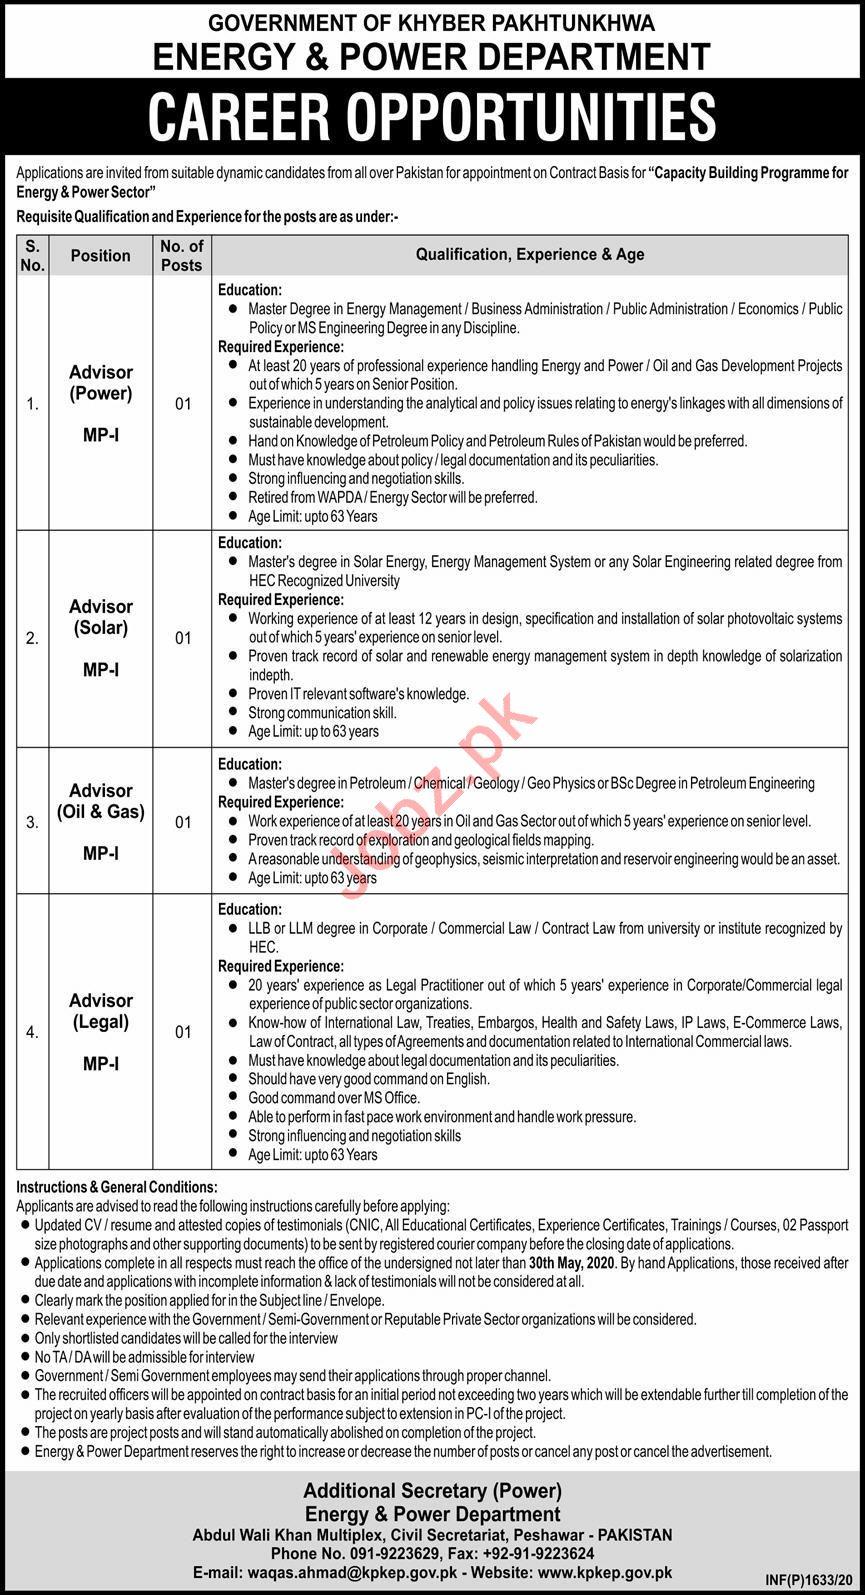 Energy & Power Department KPKEP Peshawar Jobs 2020